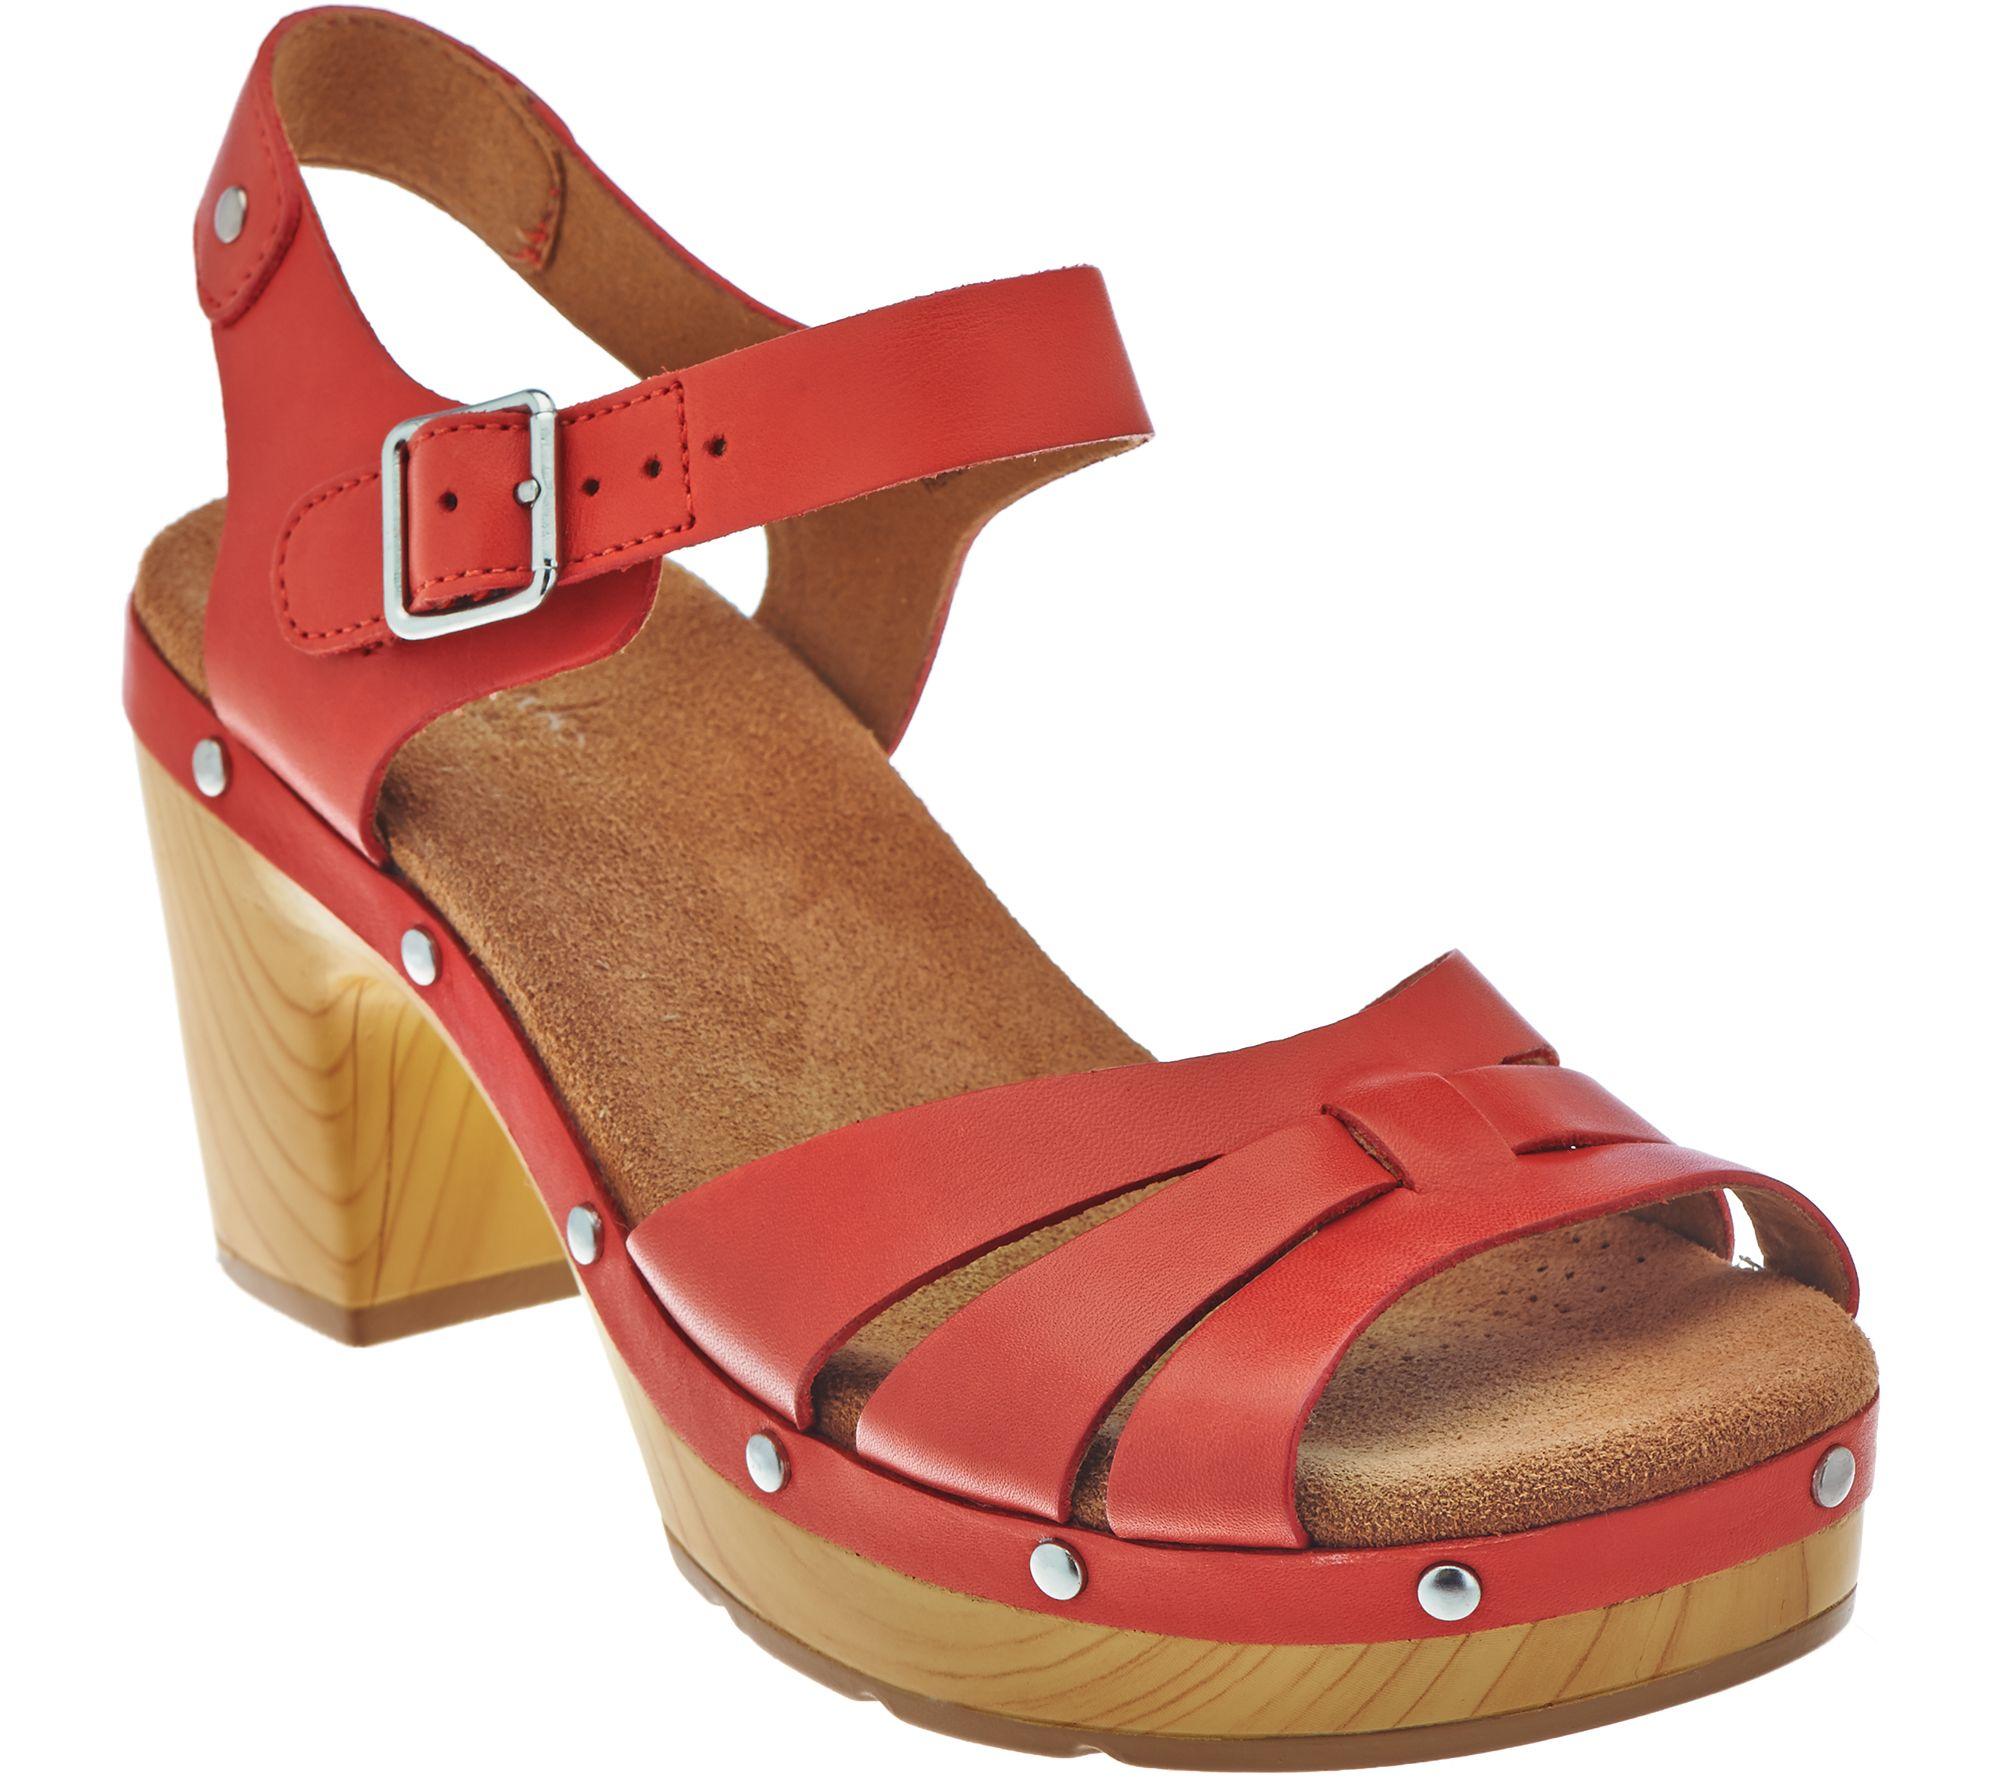 479b02e8afb0 Clarks Artisan Leather Clog Sandals - Ledella Trail - Page 1 — QVC.com